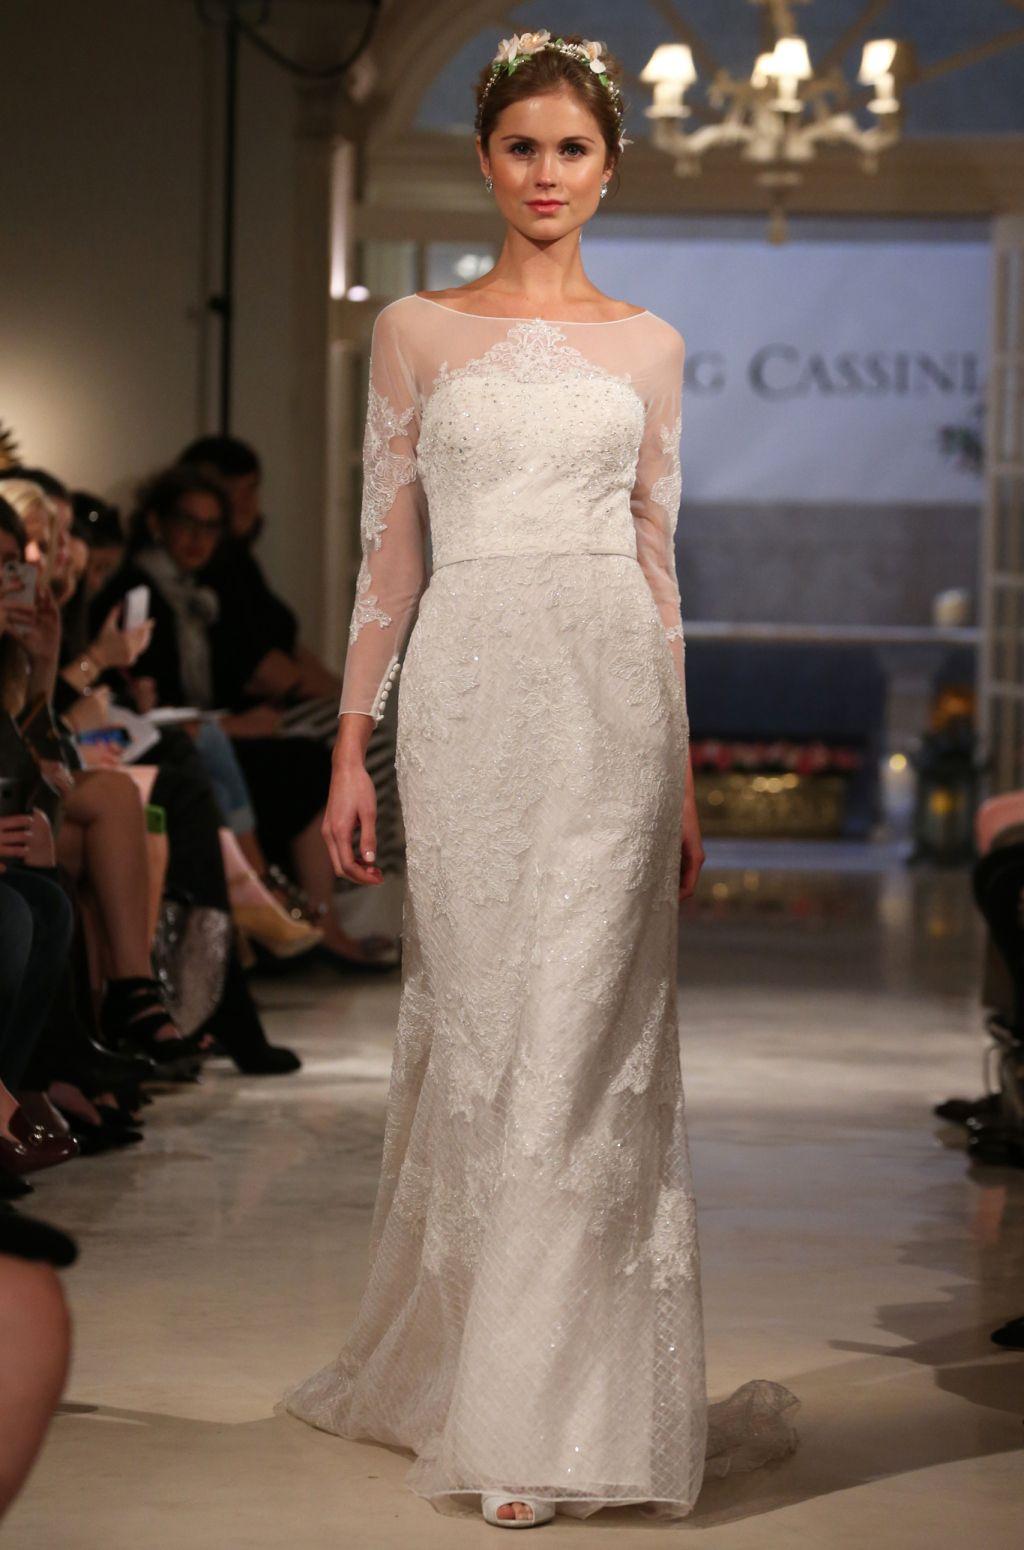 Oleg Cassini Bridal Fall 2016 (With images) Wedding